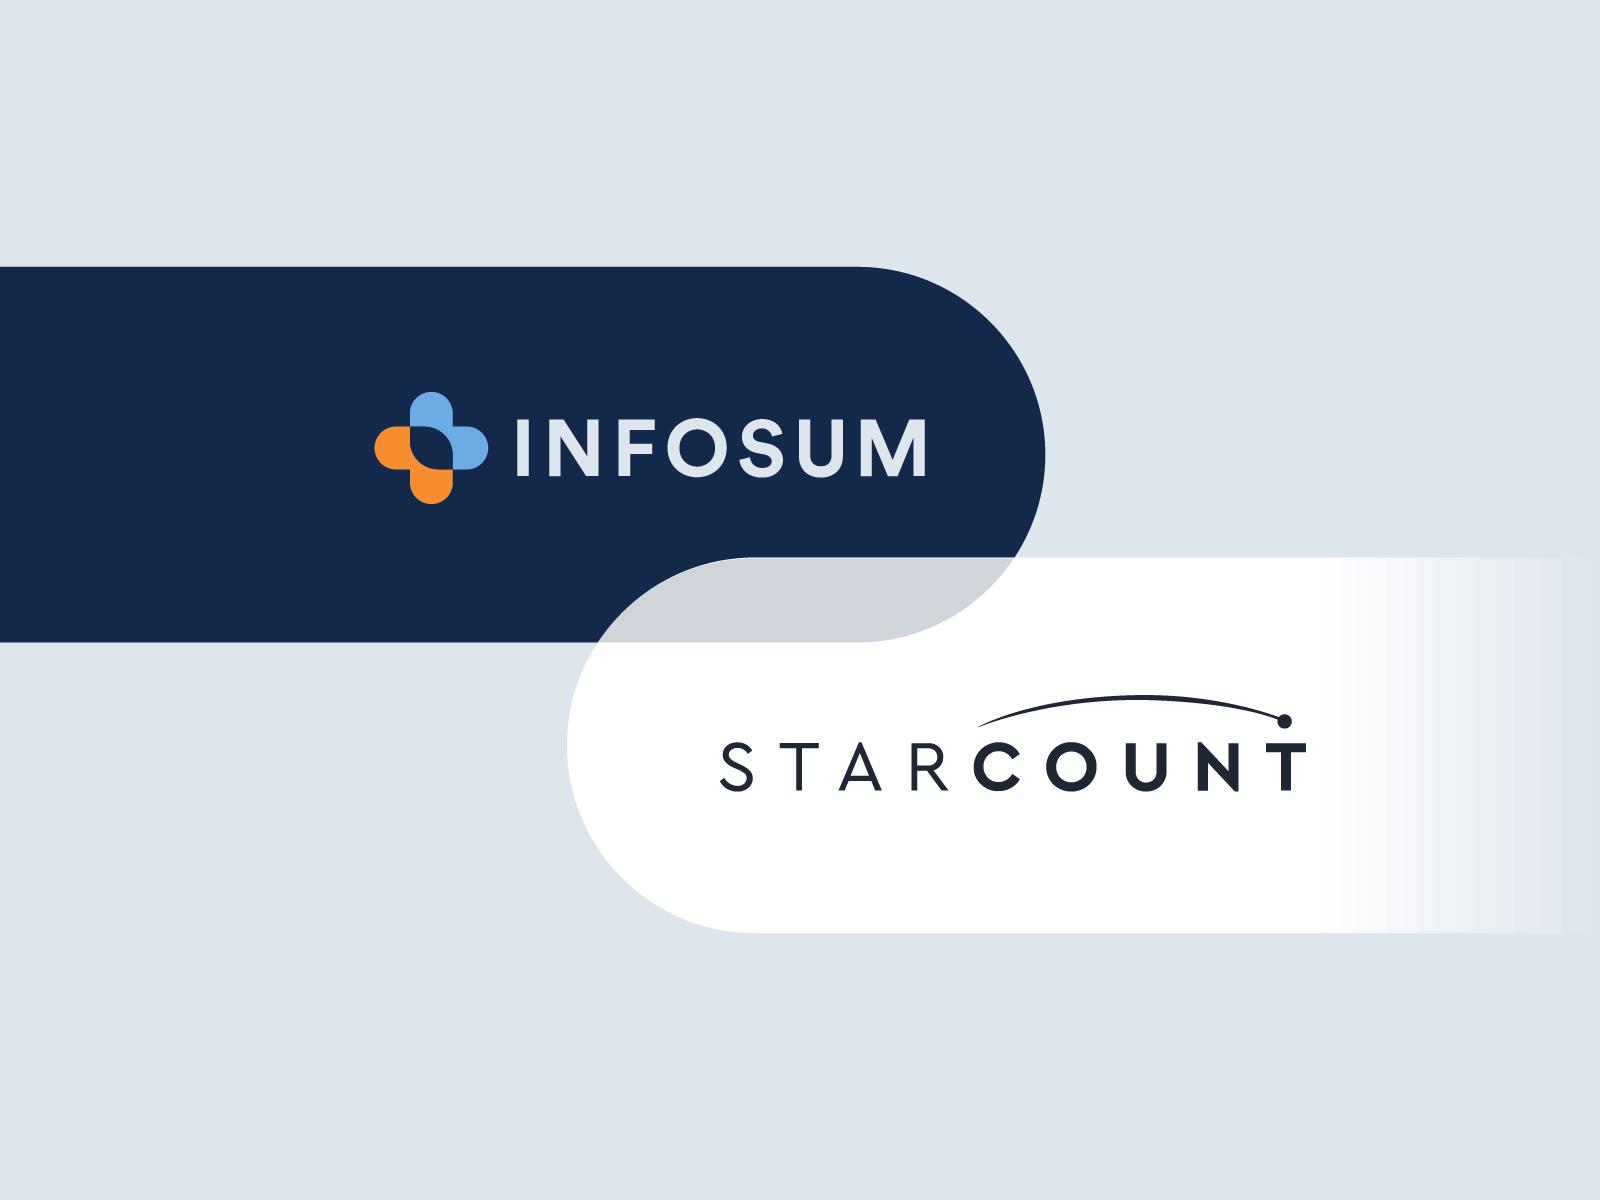 InfoSum and Starcount partner to better enhance first-party data